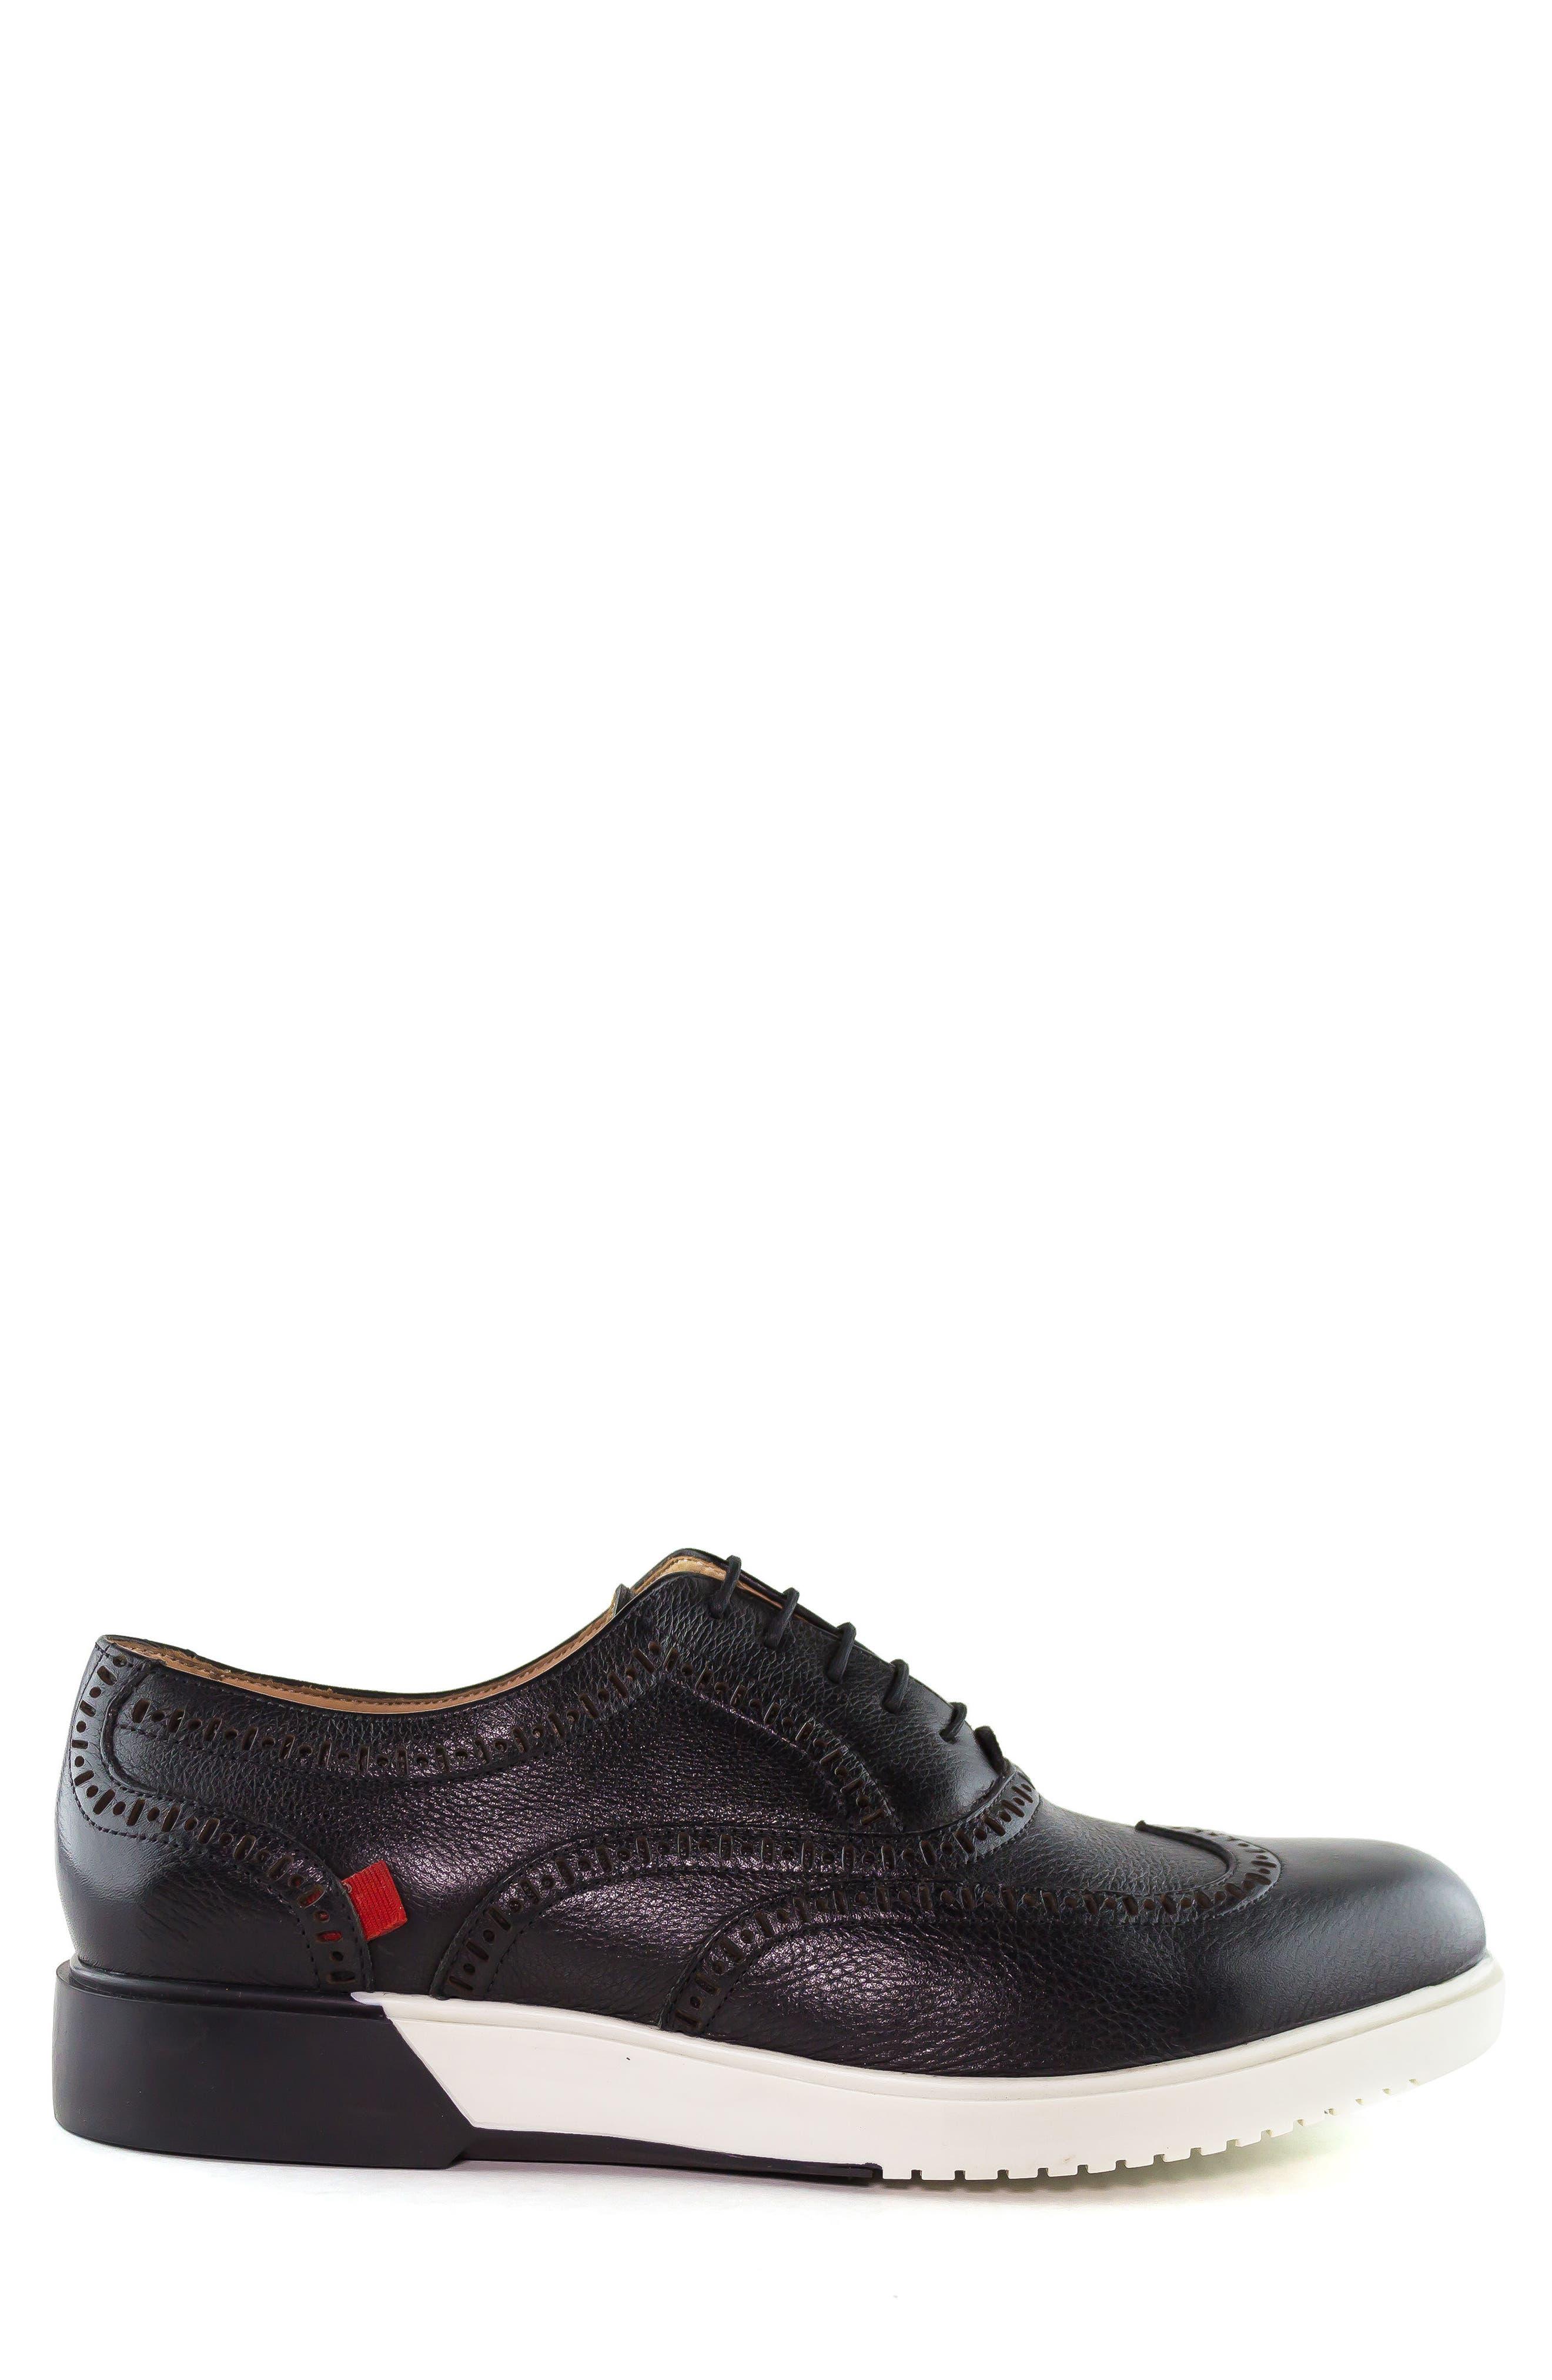 MARC JOSEPH NEW YORK, 5th Ave Wingtip Sneaker, Alternate thumbnail 3, color, 001